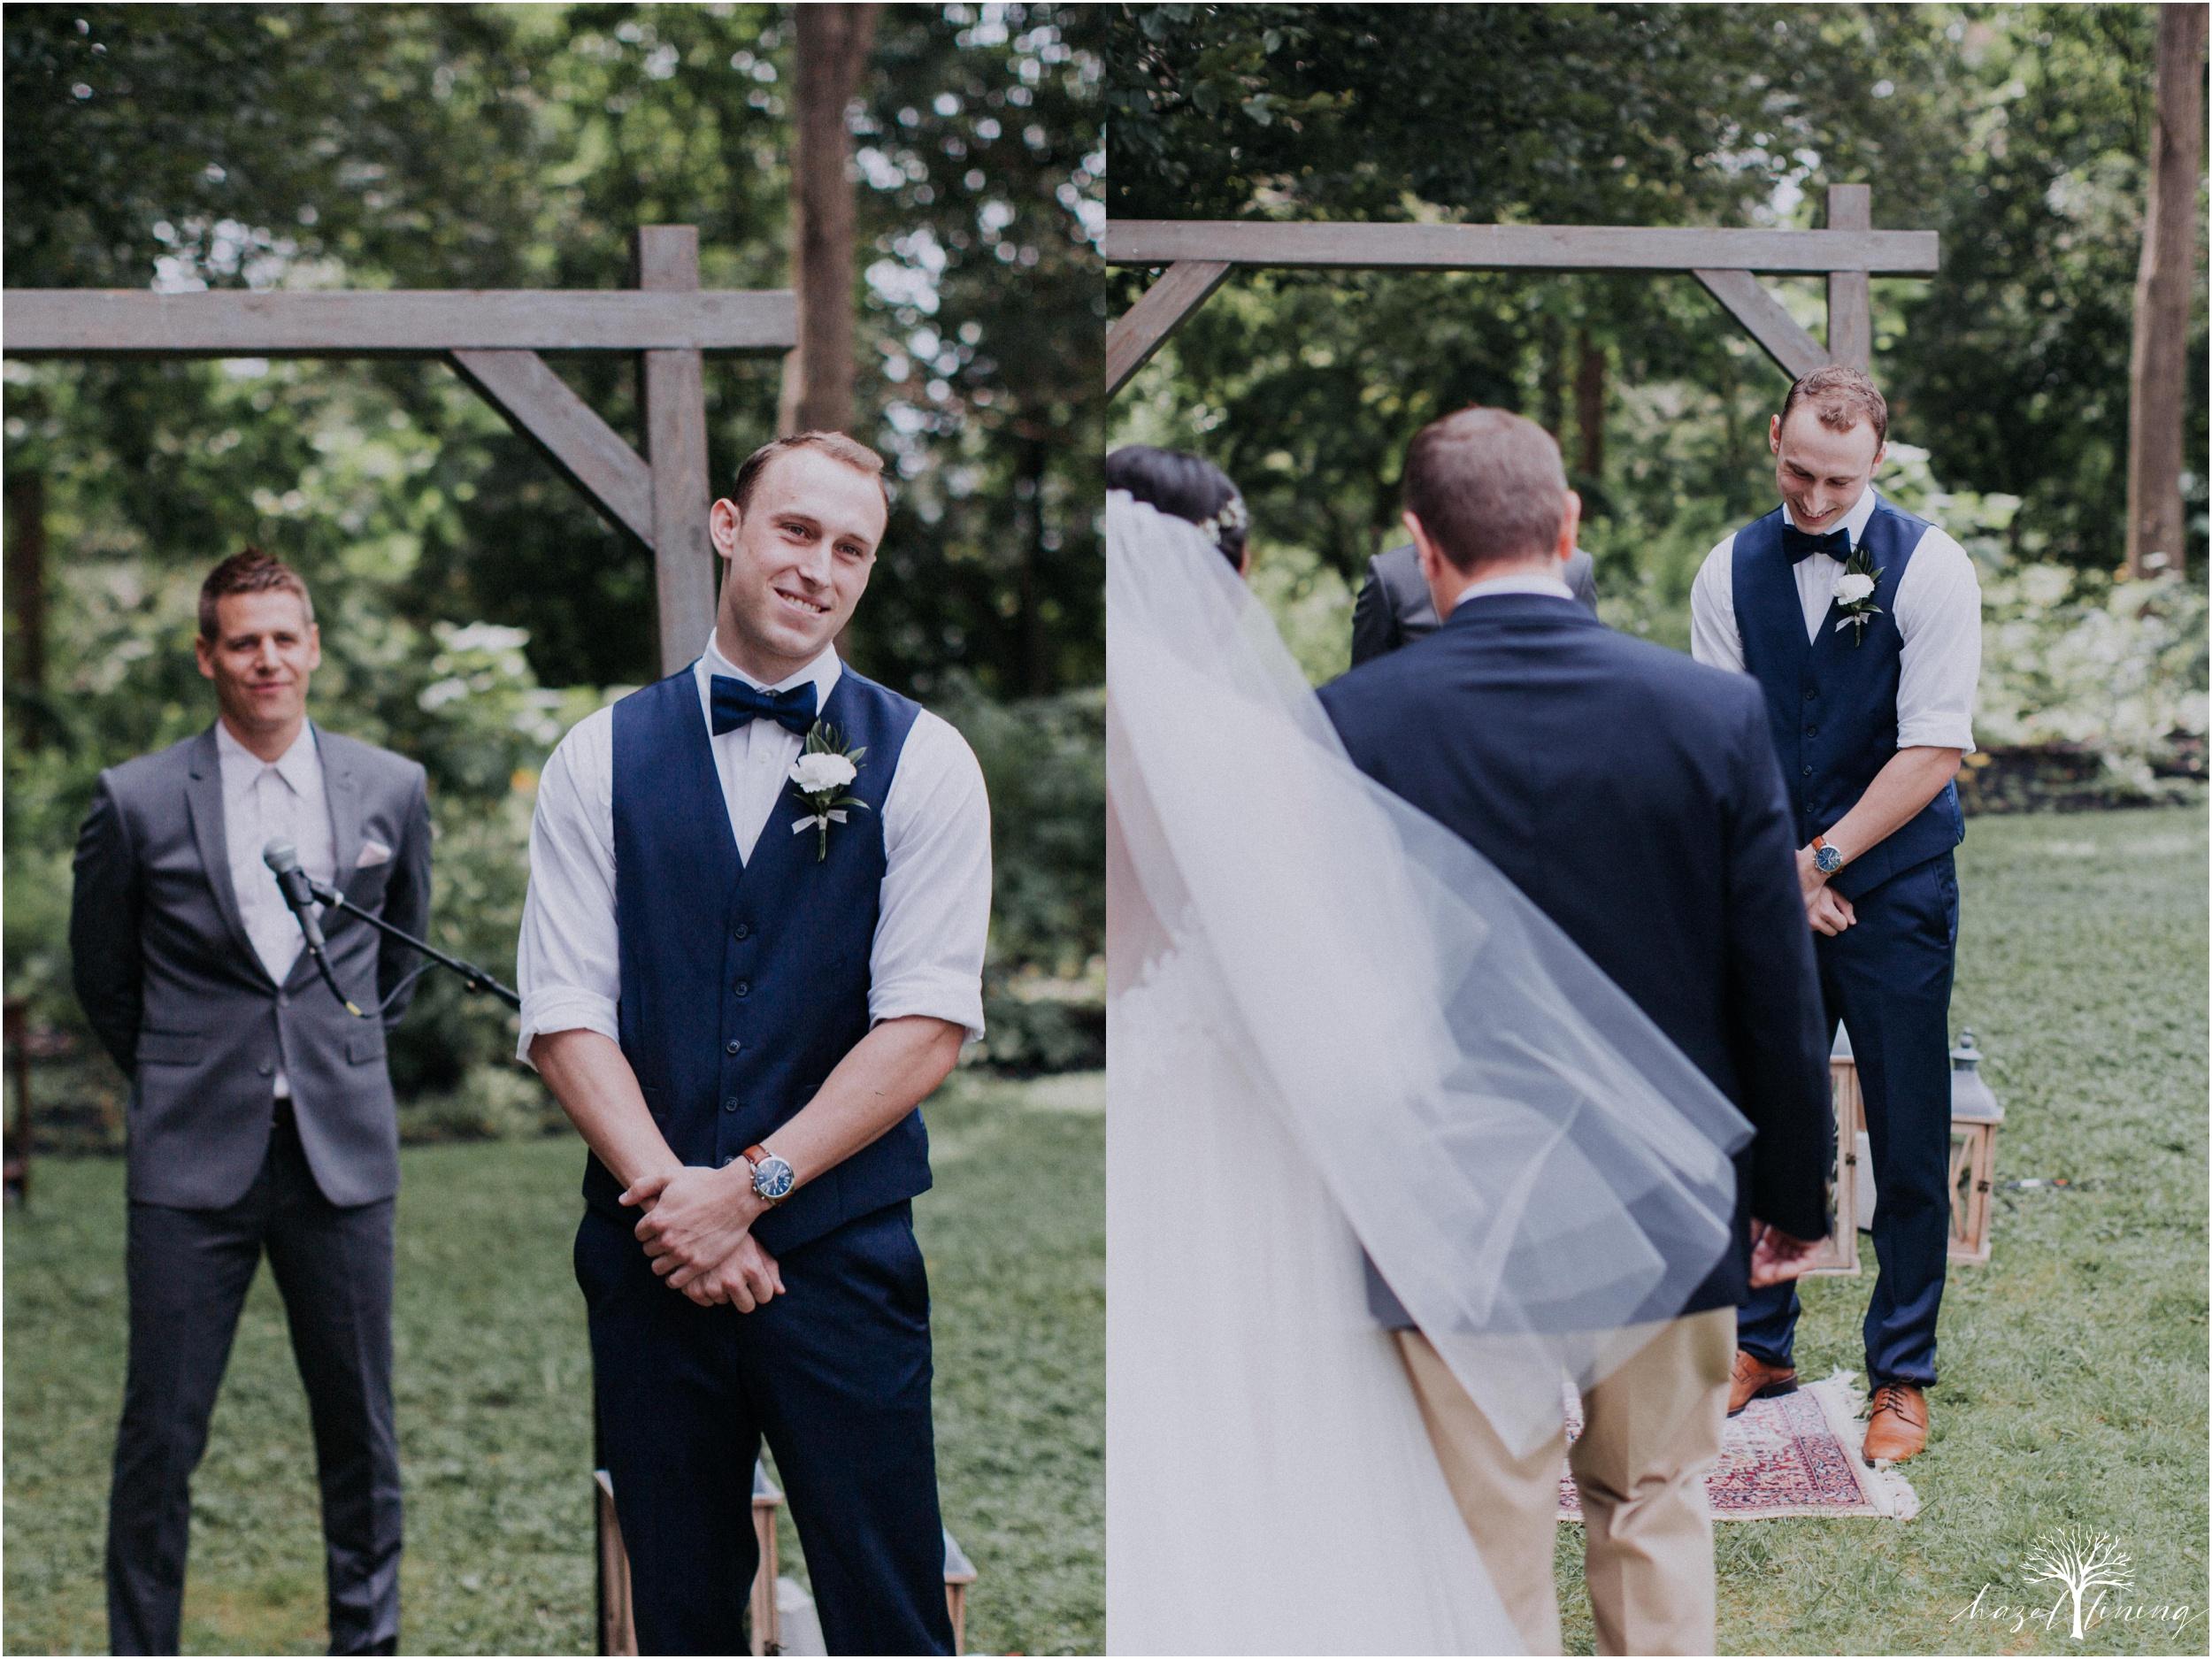 mariah-kreyling-samuel-sherratt-sherrattwiththeworld-peirce-farm-at-witch-hill-boston-massachusetts-wedding-photography-hazel-lining-travel-wedding-elopement-photography_0079.jpg